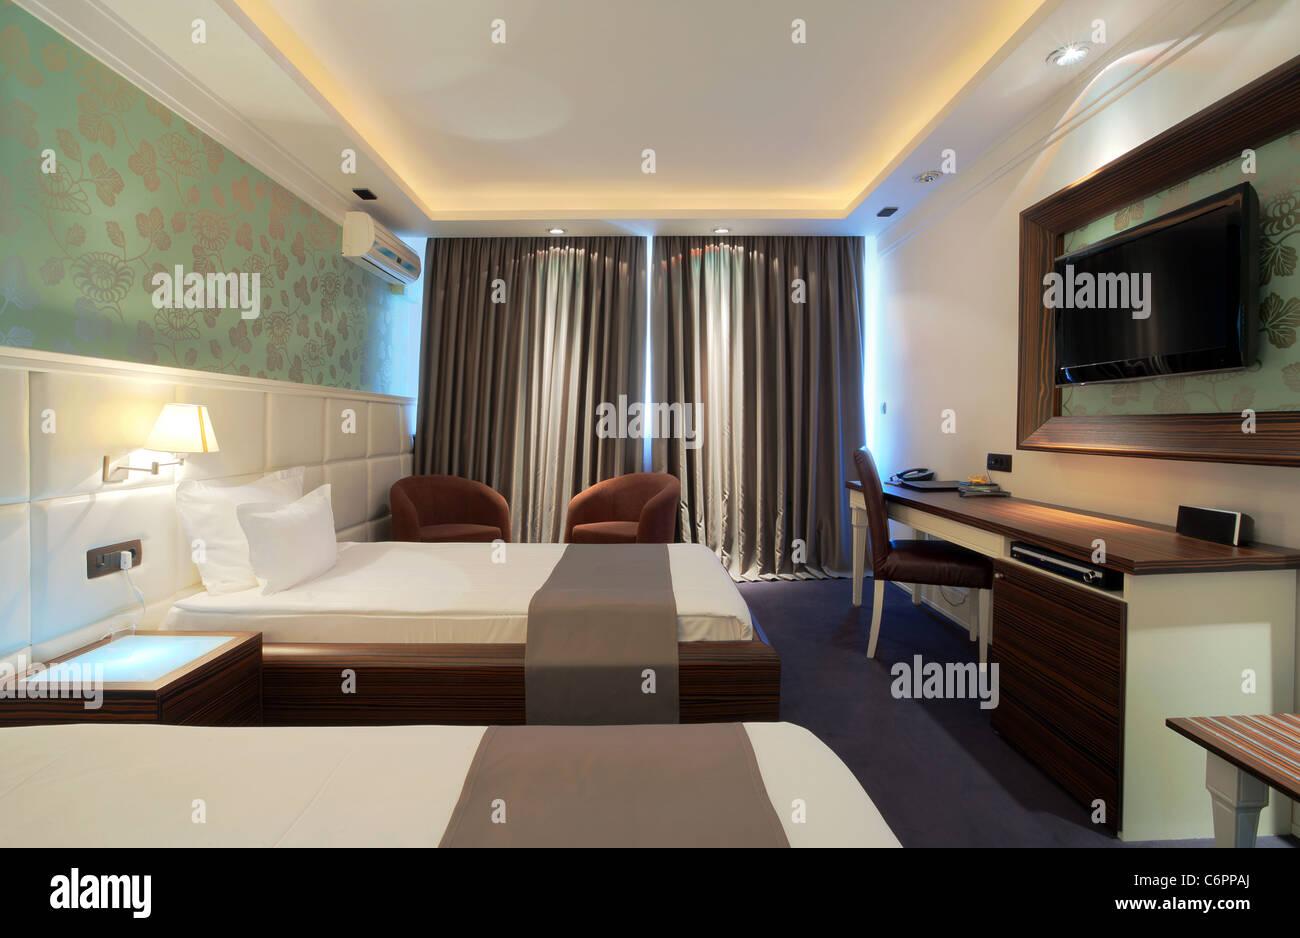 Modern Contemporary Interior Design interior of a hotel room with furniture, modern contemporary